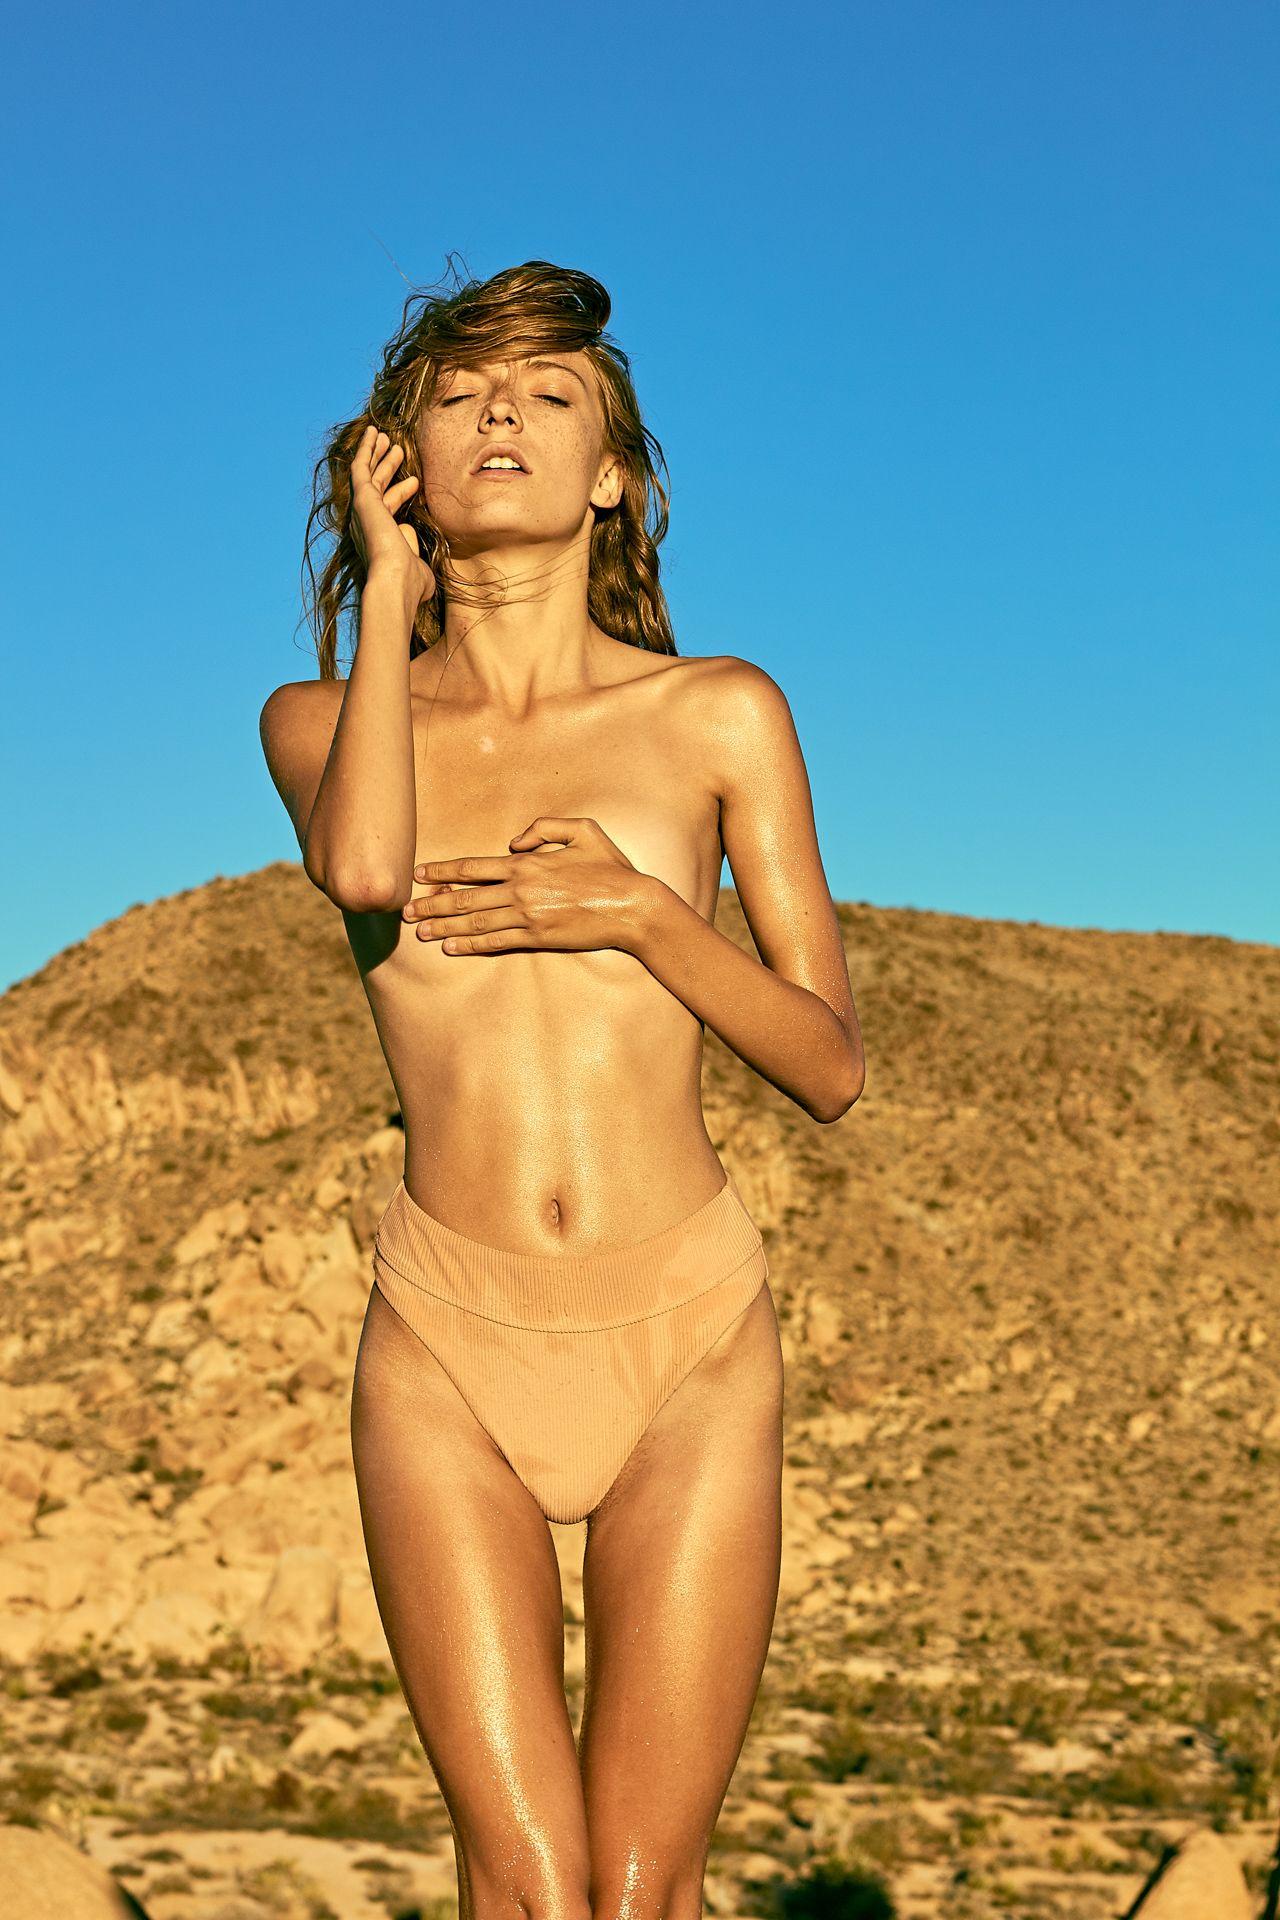 Lauren Hurlbut nudes (73 photo), Pussy, Paparazzi, Instagram, swimsuit 2015